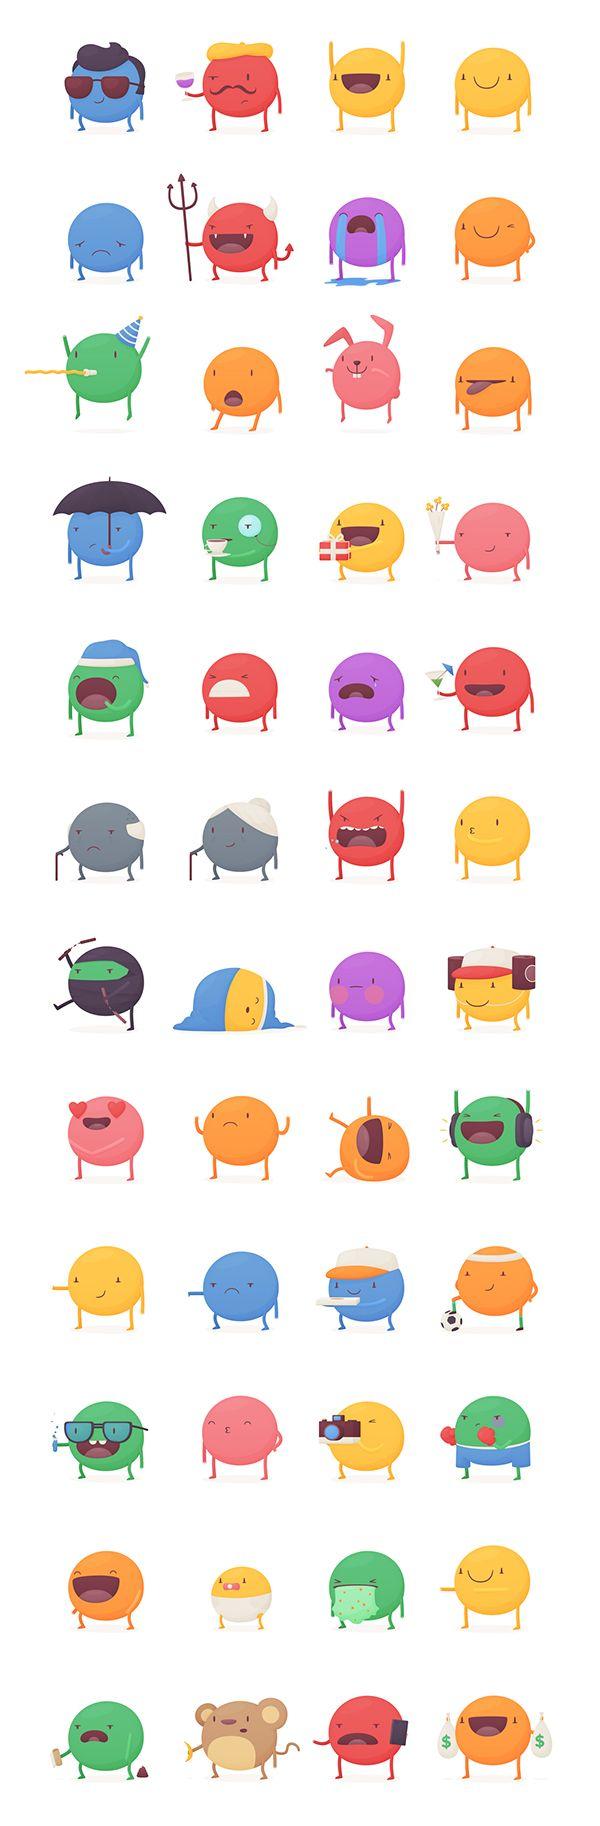 KeWe Stickers by Thomas Fitzpatrick, via Behance